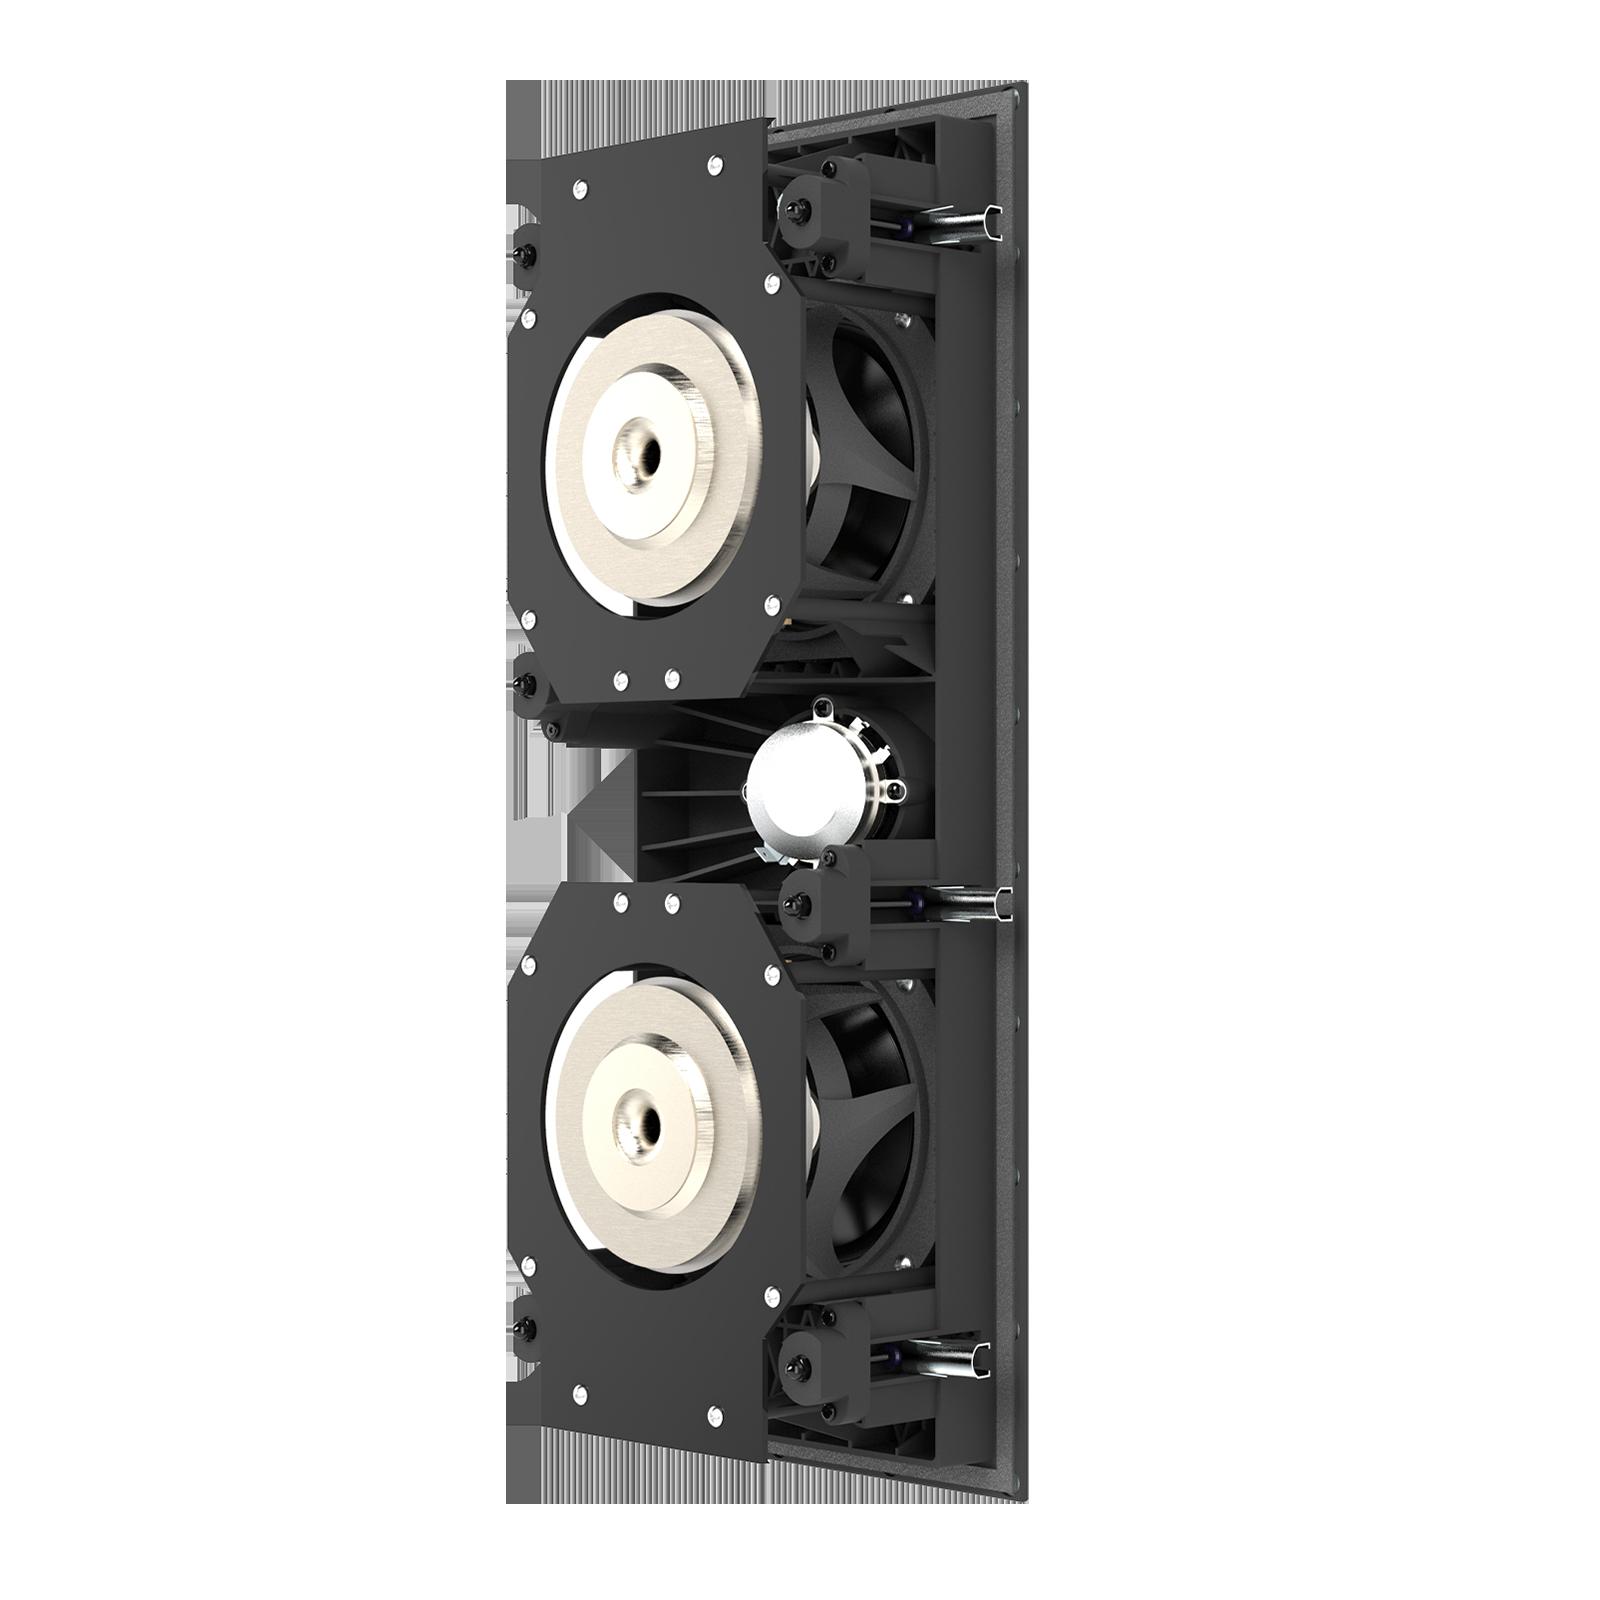 SCL-7 - Black - 2-Way Dual 5.25-inch (130mm) In-Wall Loudspeaker - Back